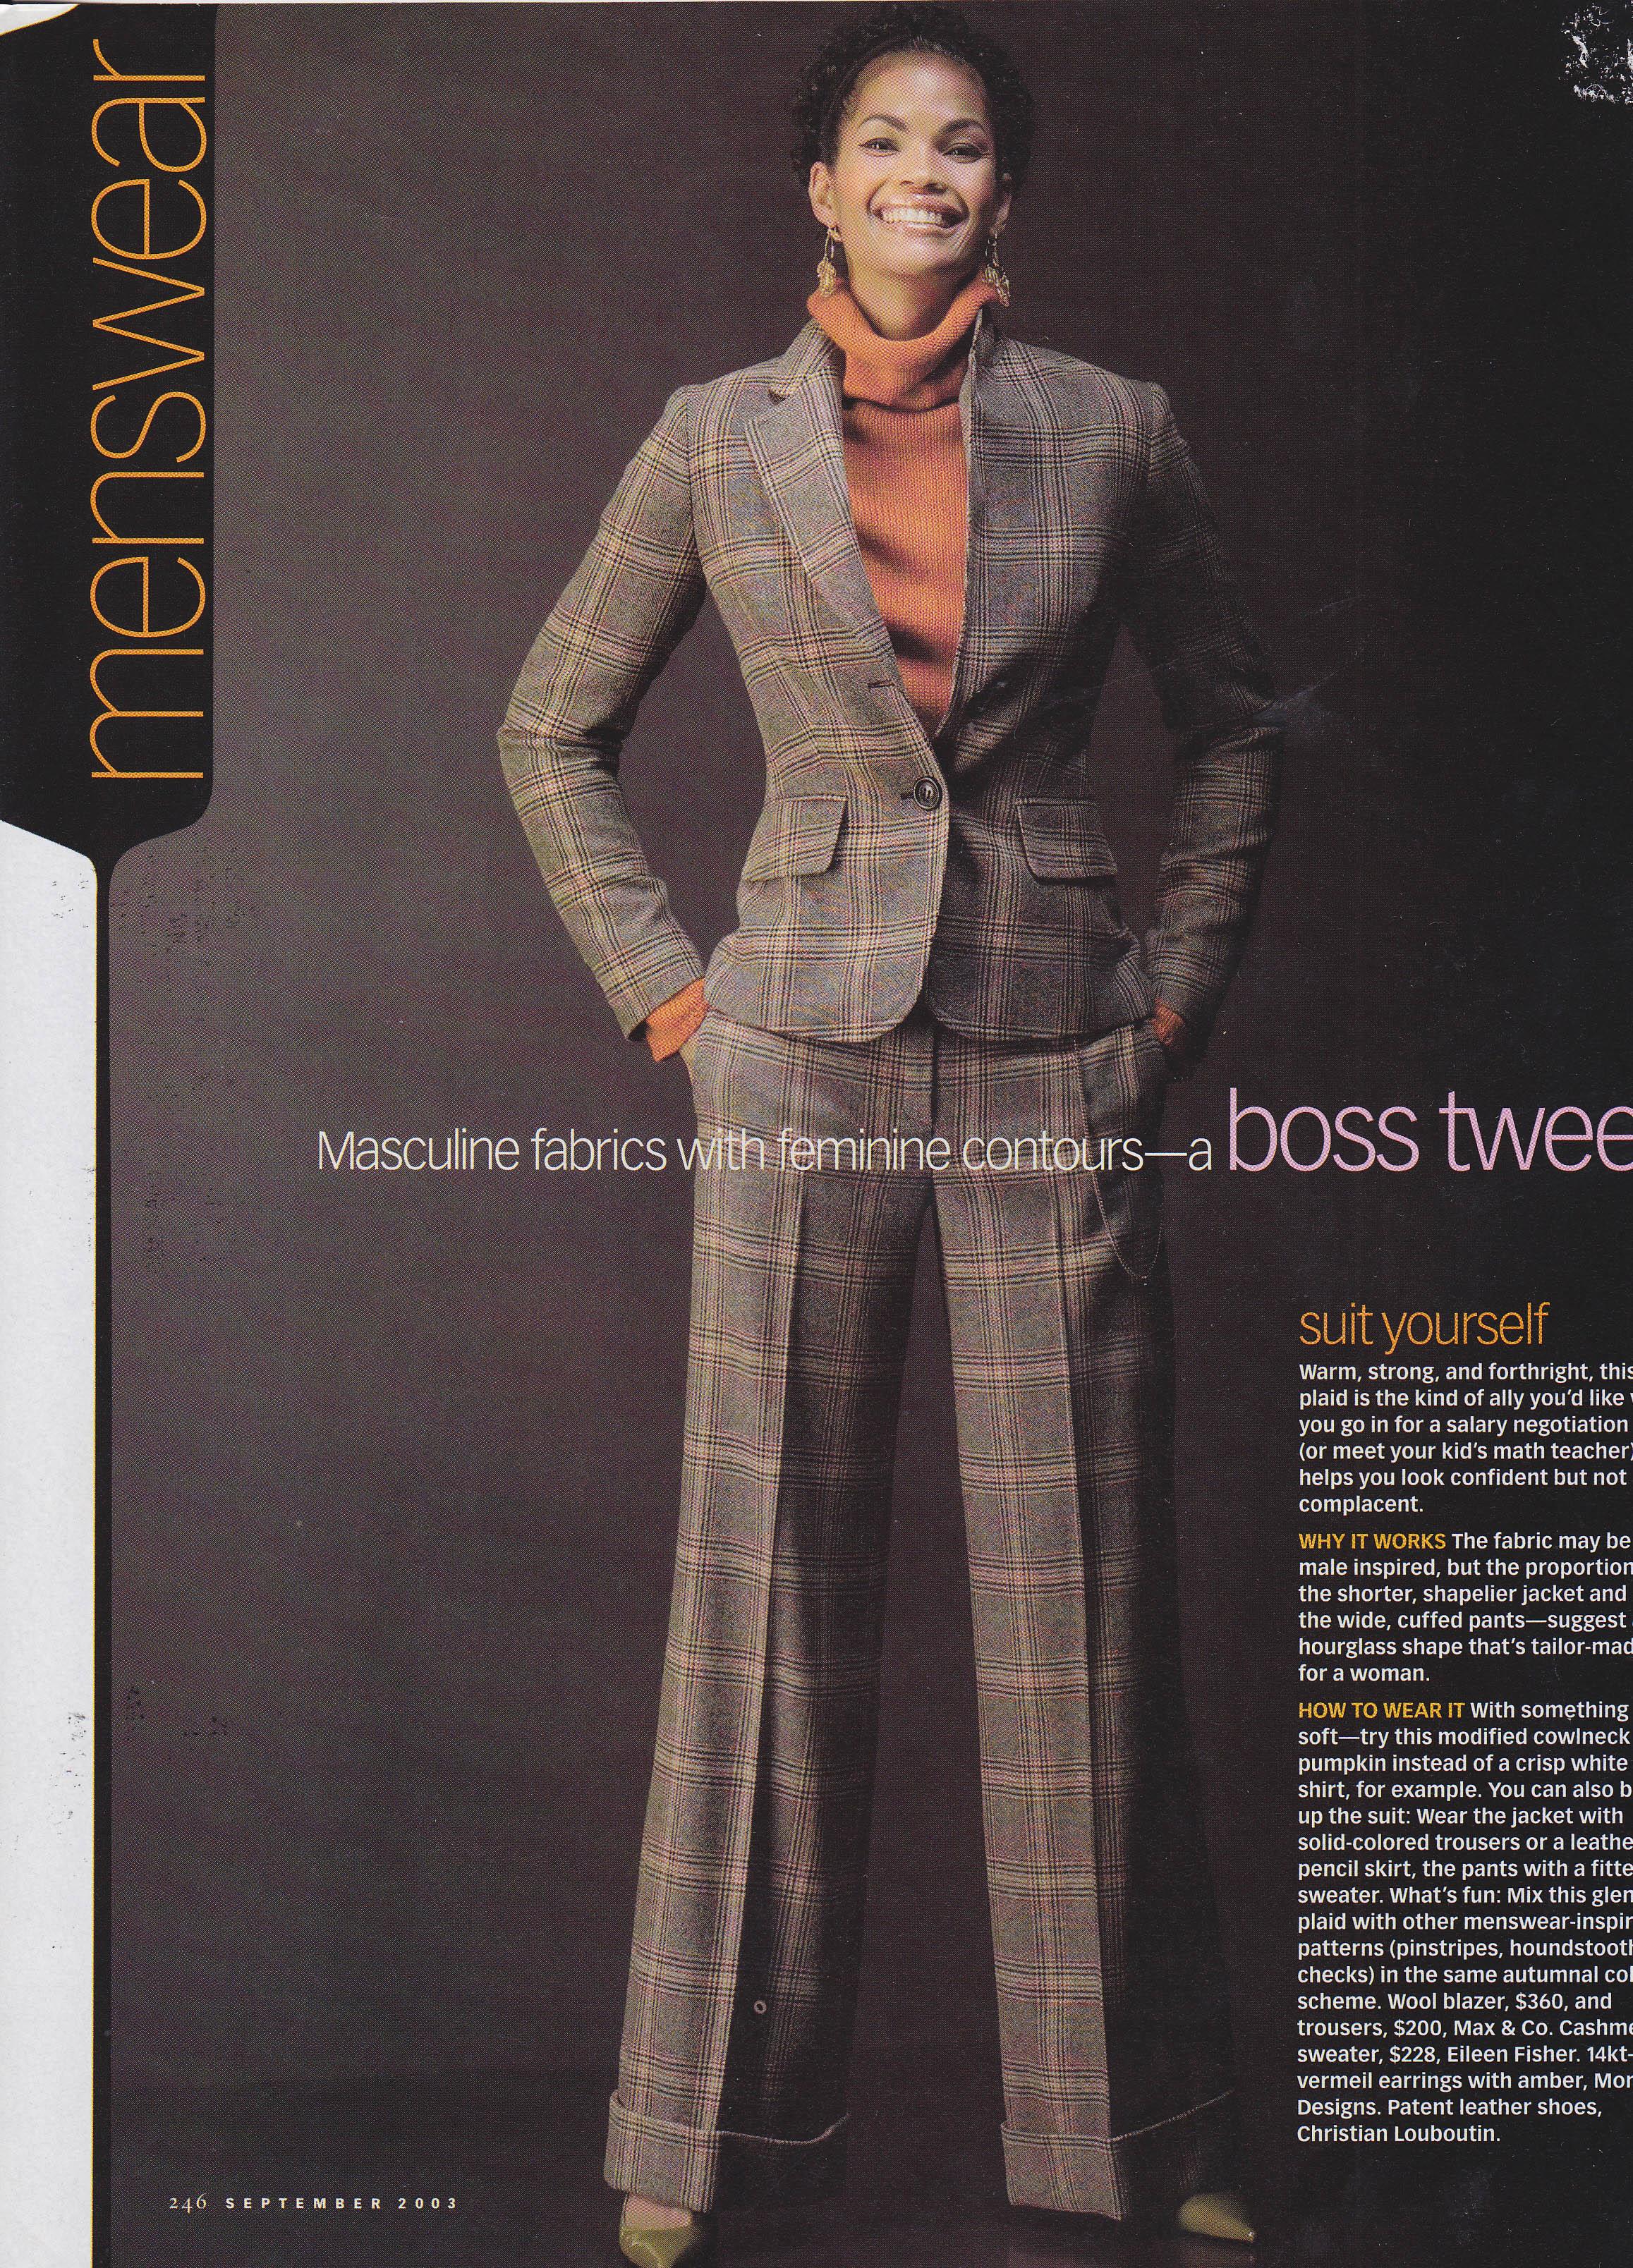 September 2003 O Magazine